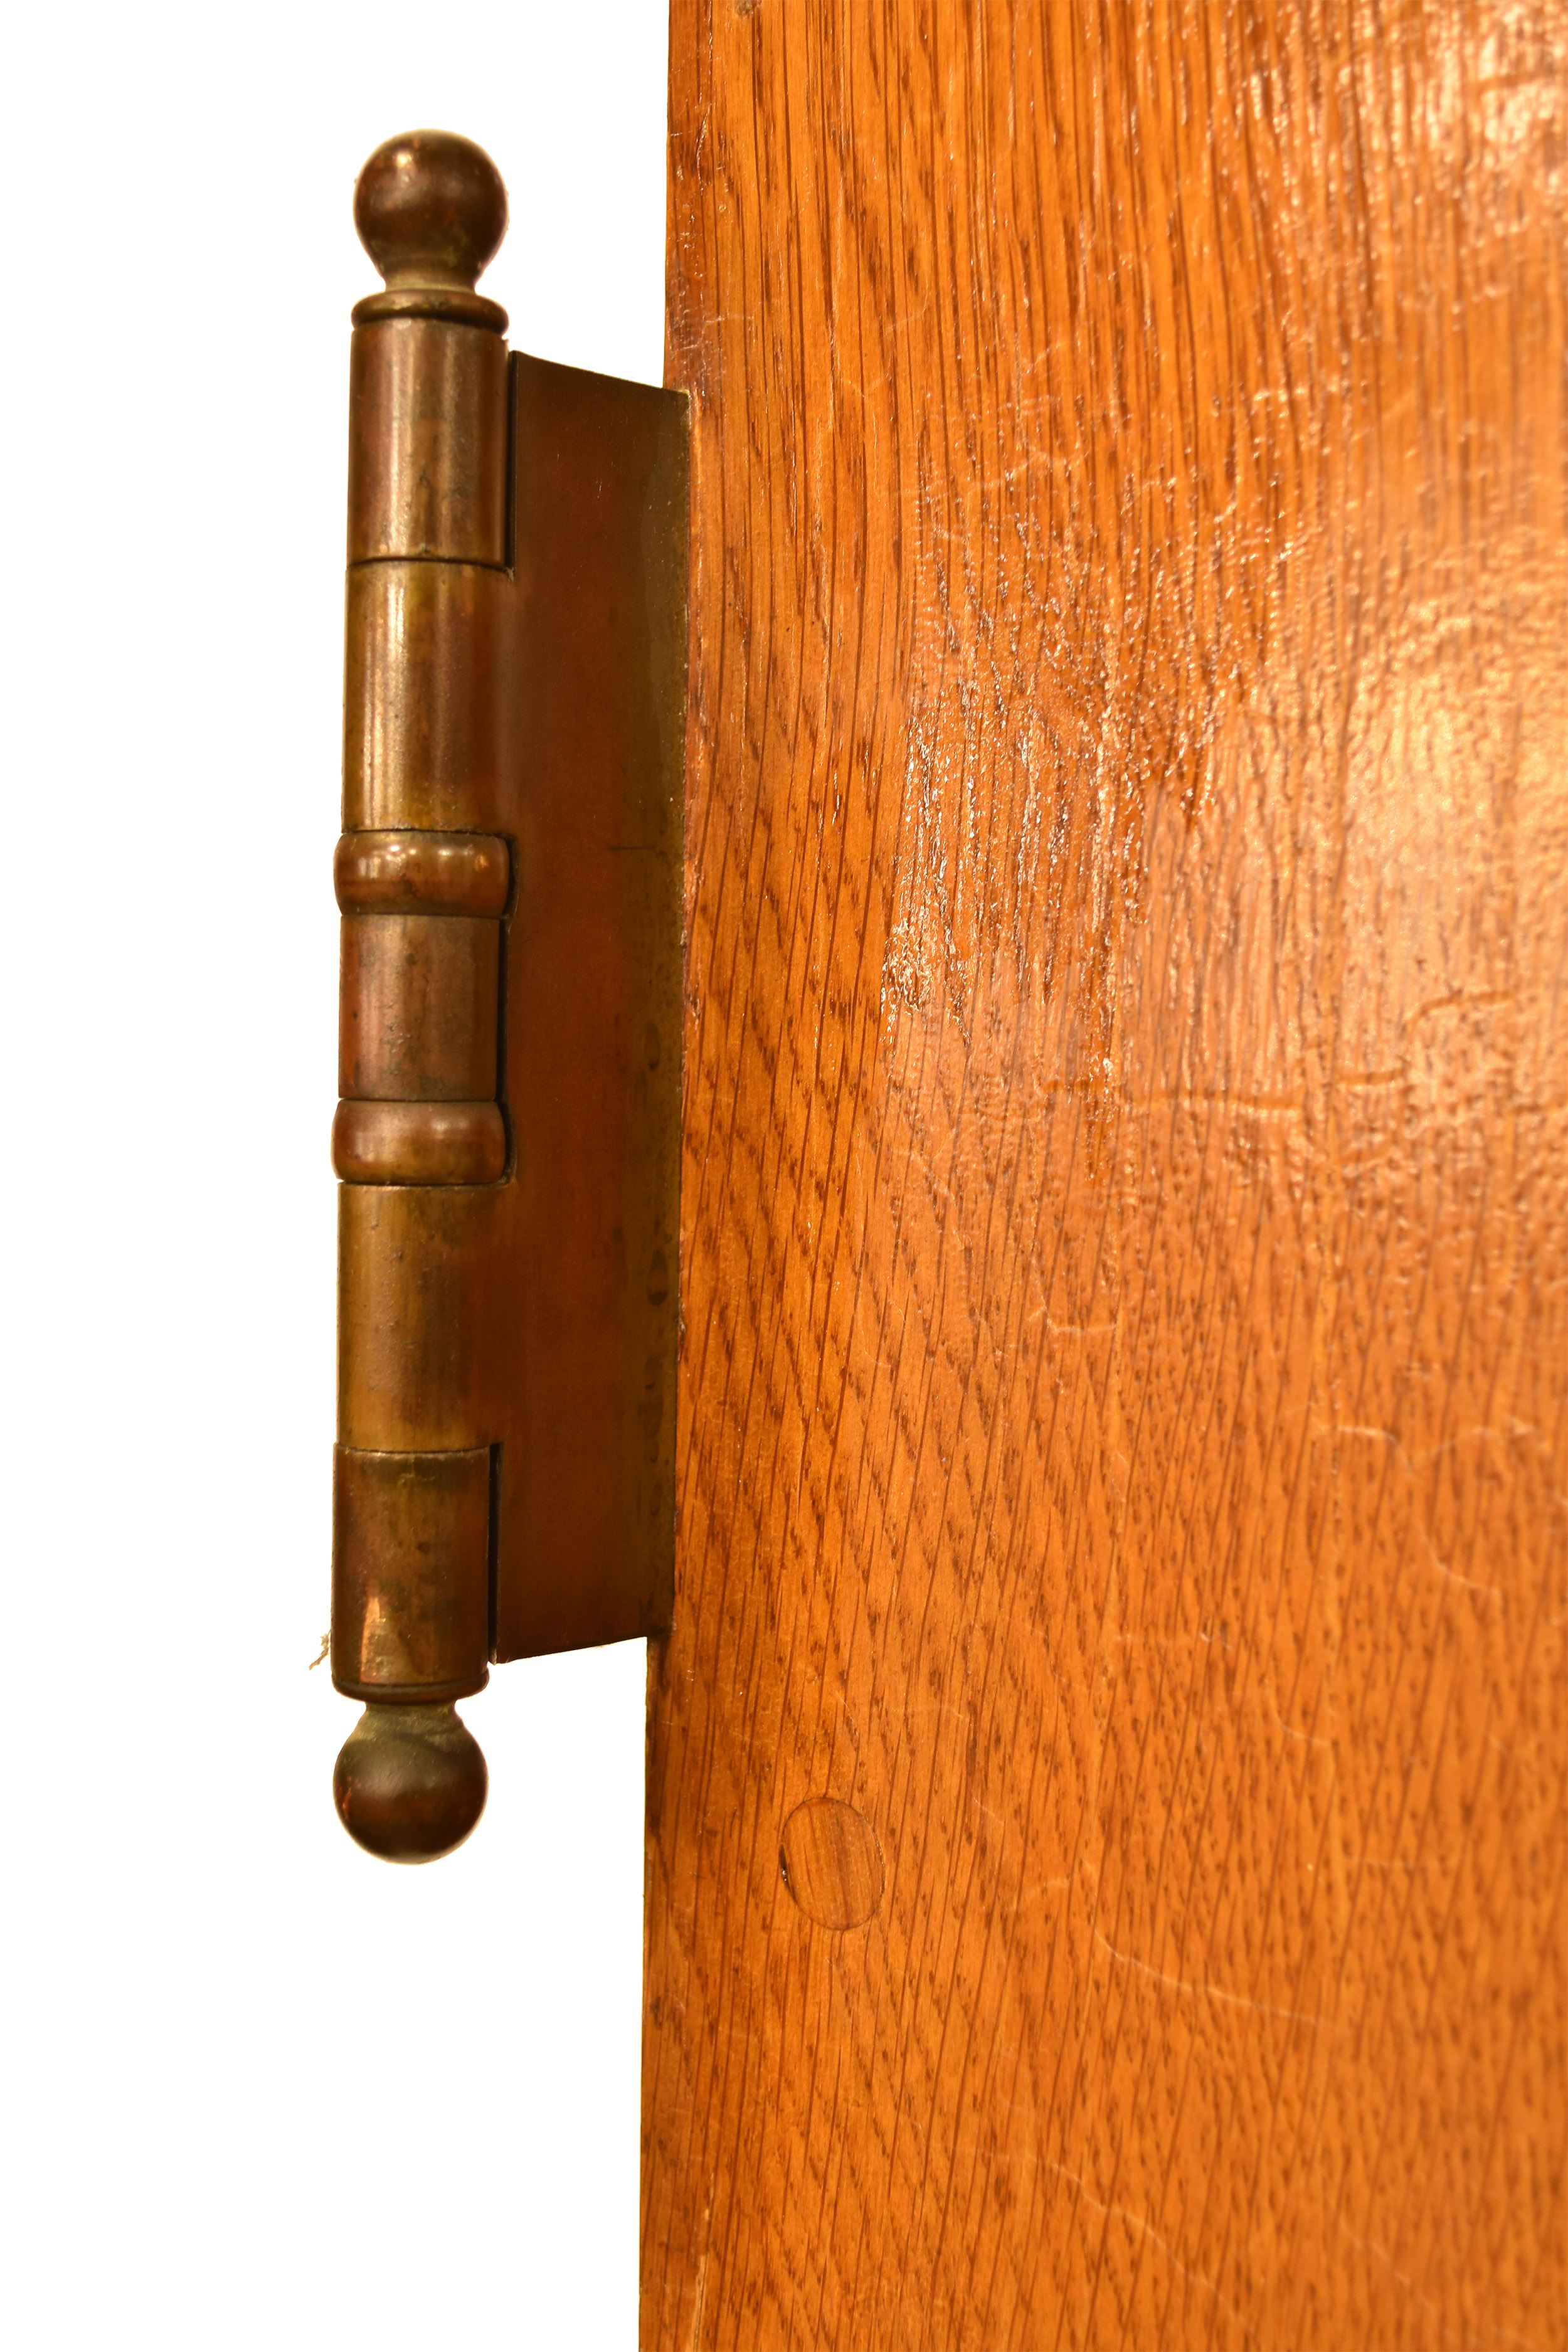 48407 oak double door 8 lite clear glass bb hinge.jpg